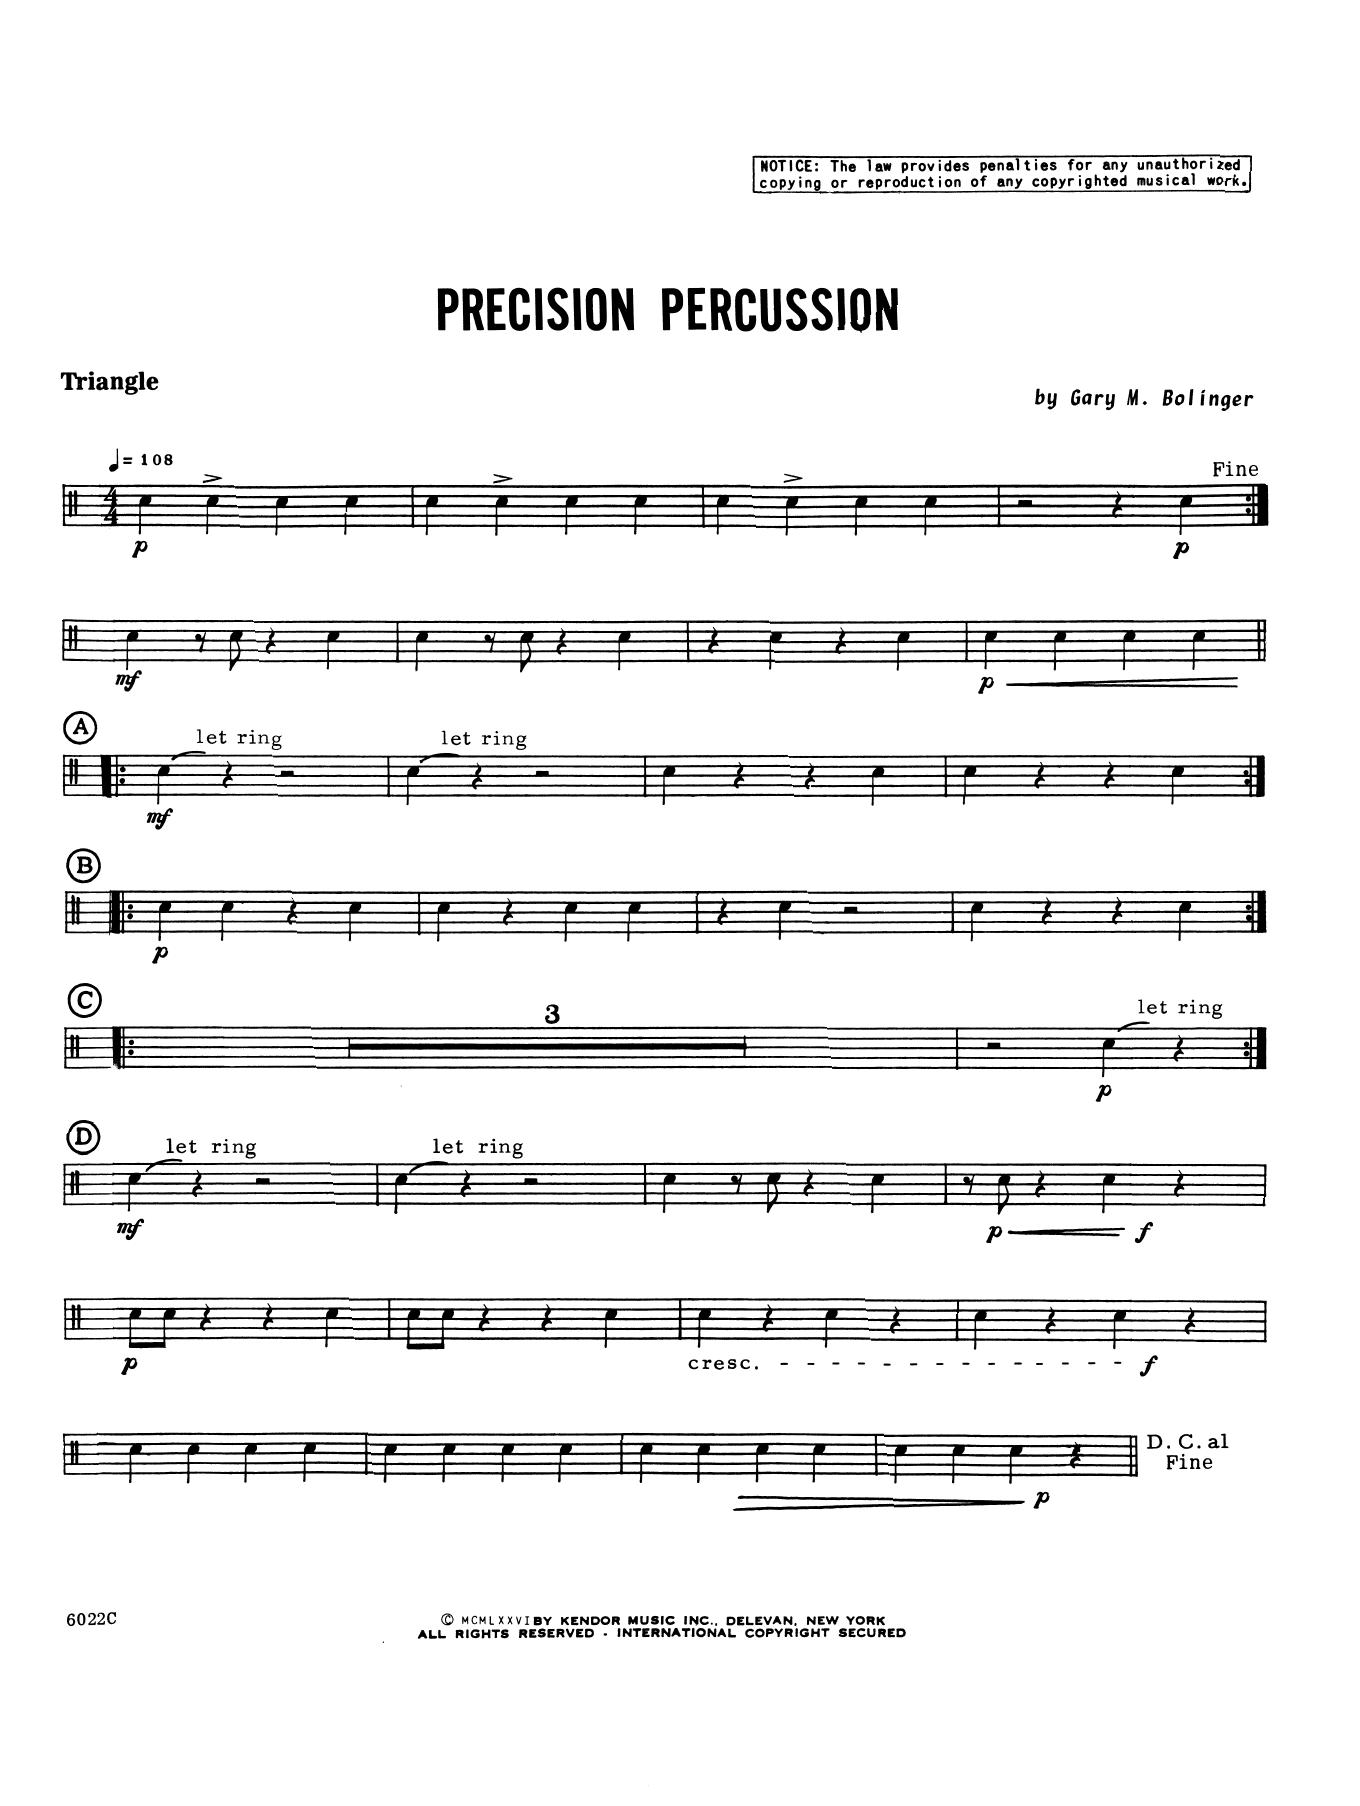 Gary M. Bolinger Precision Percussion - Percussion 2 sheet music notes printable PDF score